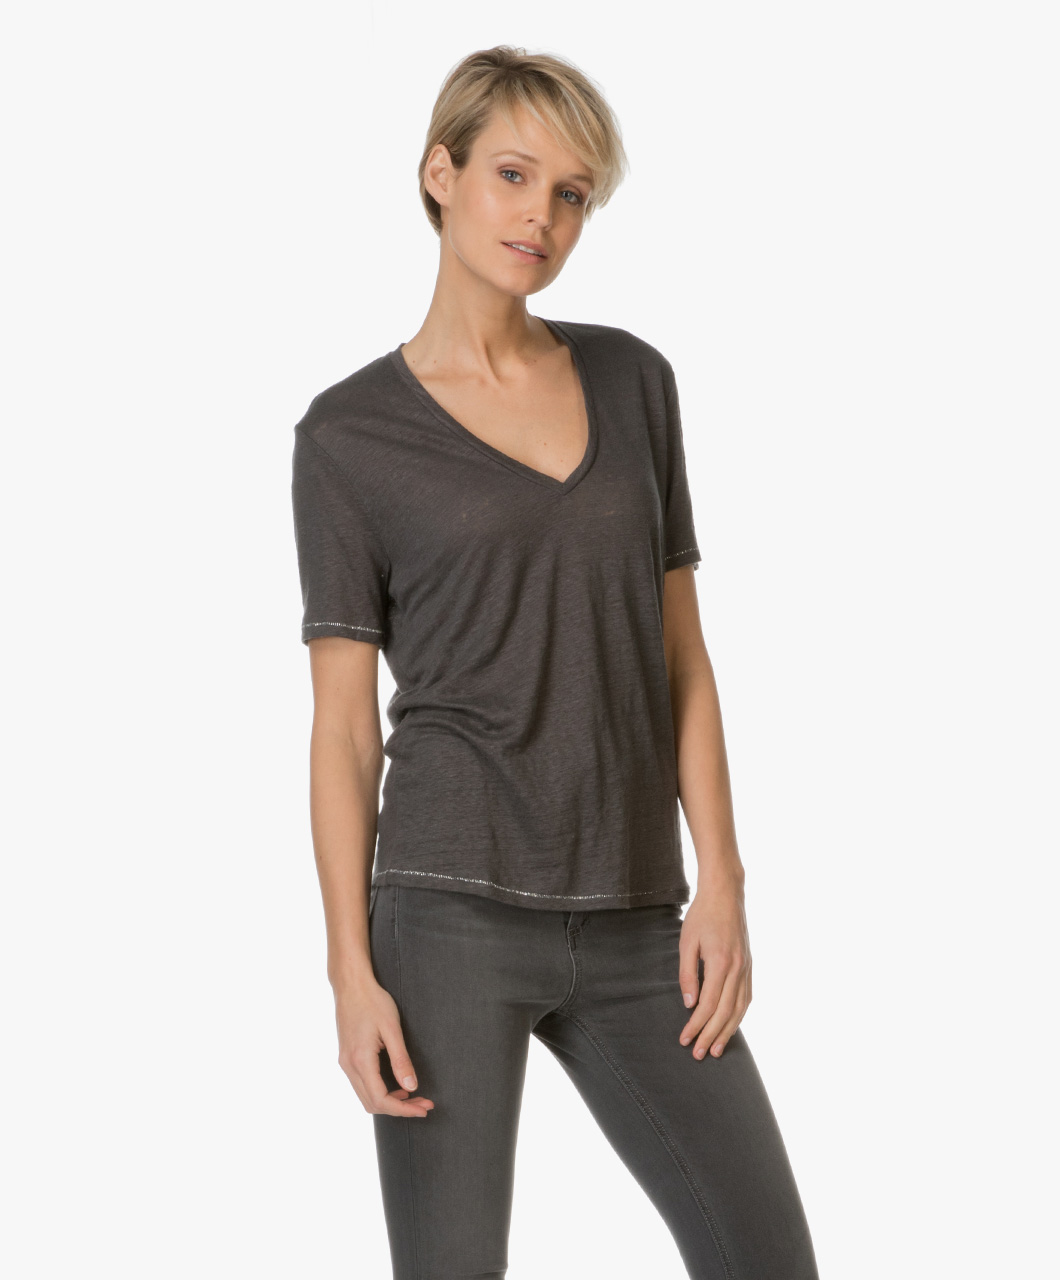 drykorn casa linen t shirt antracite casa 502108 2 antra. Black Bedroom Furniture Sets. Home Design Ideas